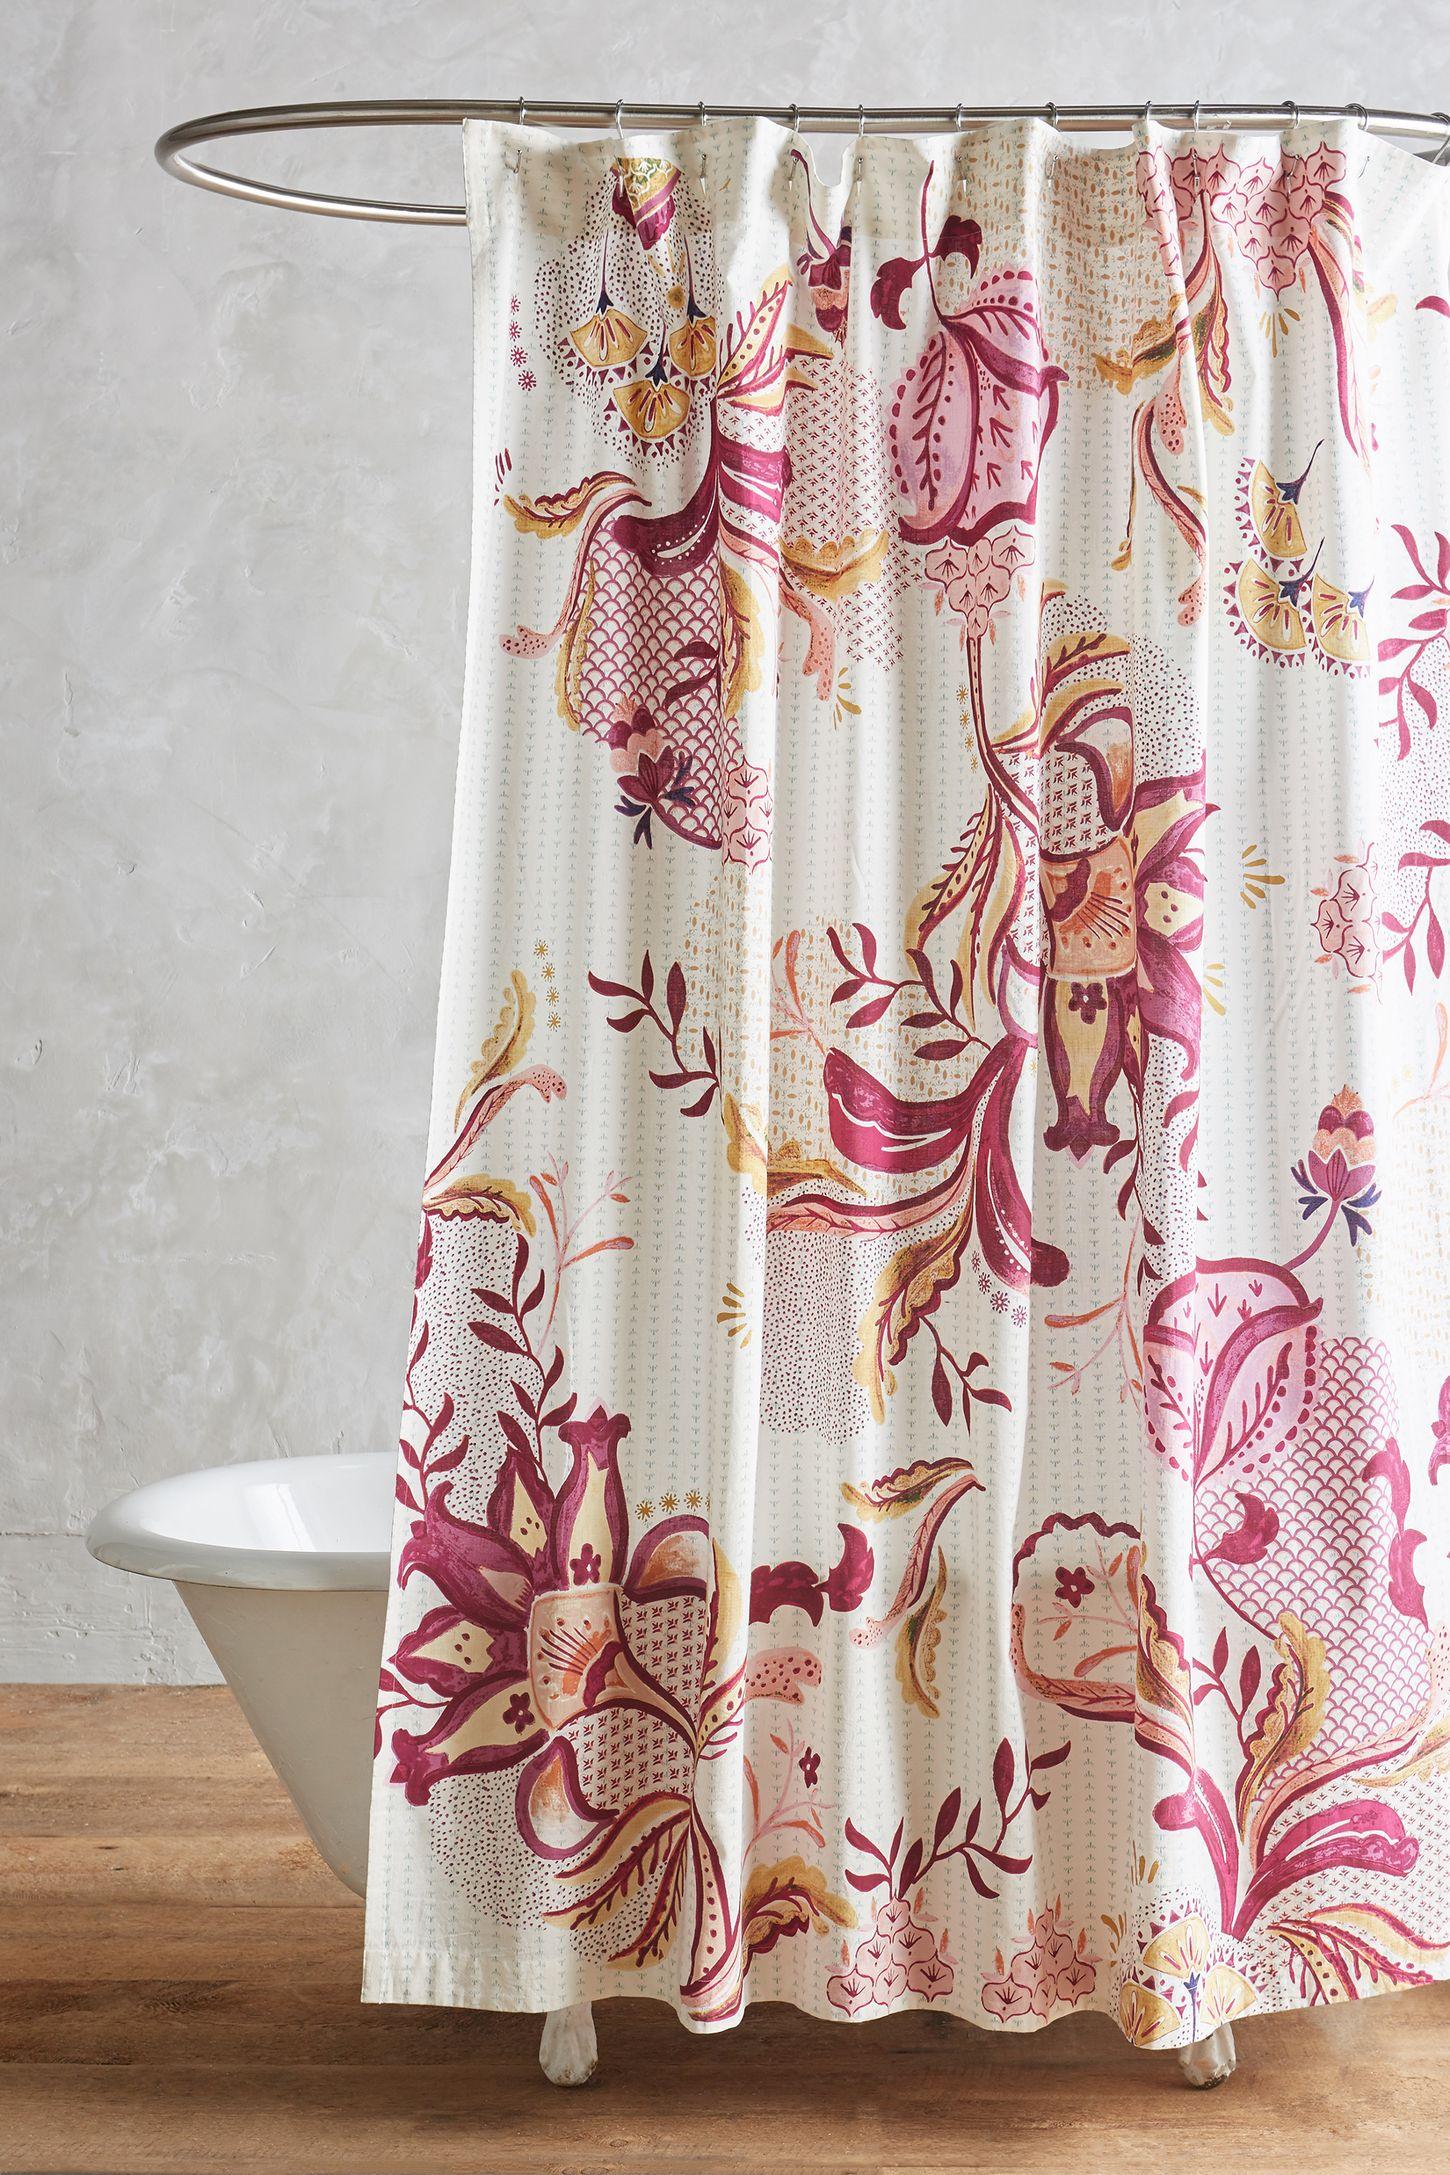 Anthropologie floral shower curtain - Anthropologie Floral Shower Curtain 36